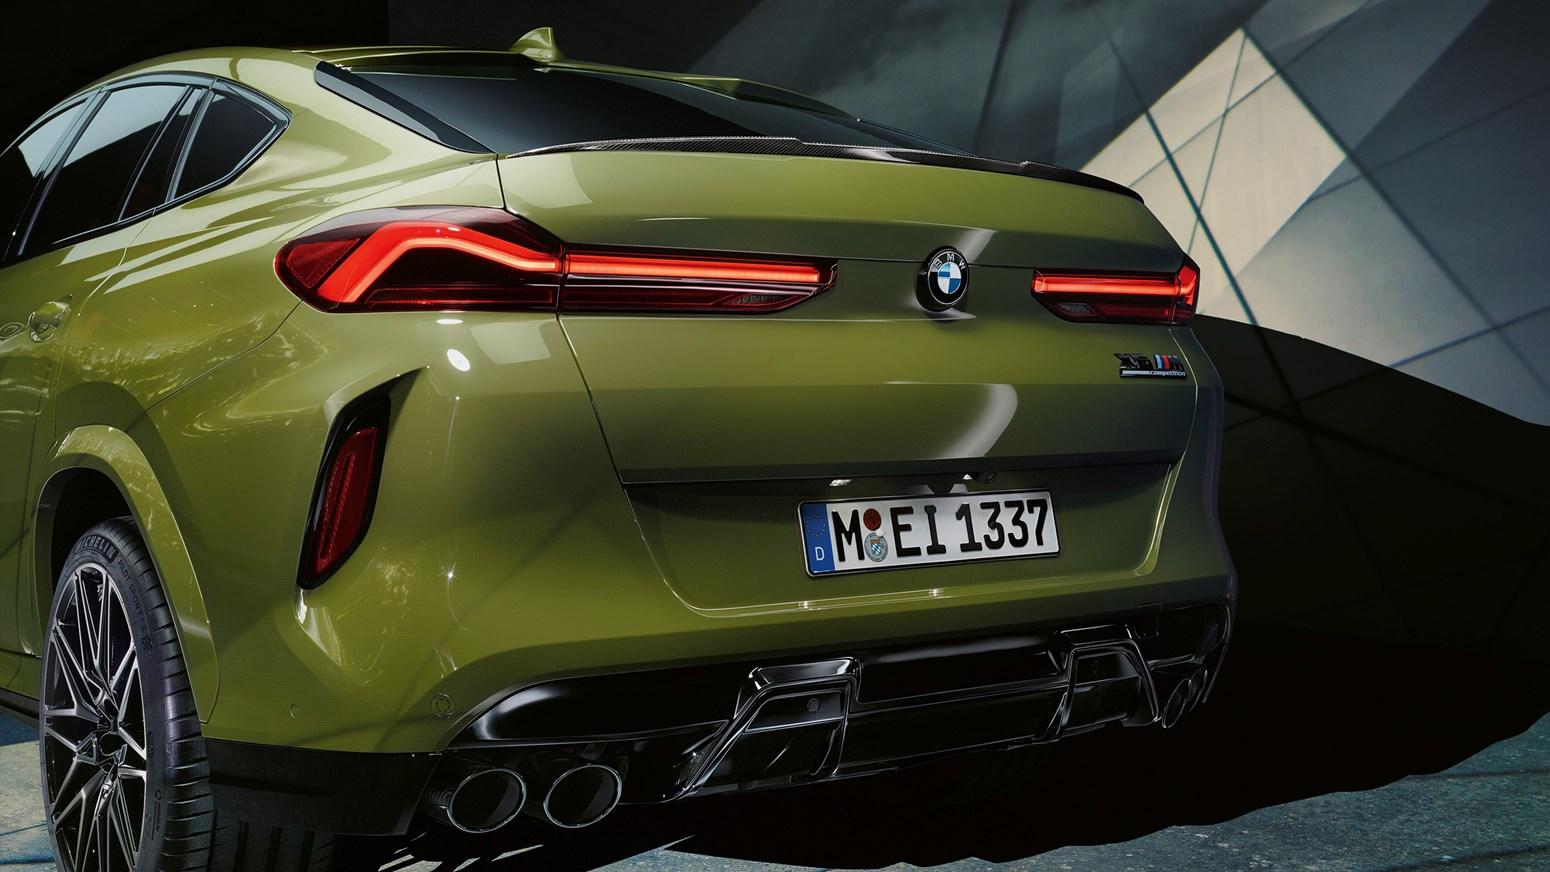 BMW X6 M GALLERY 2440X1373 B